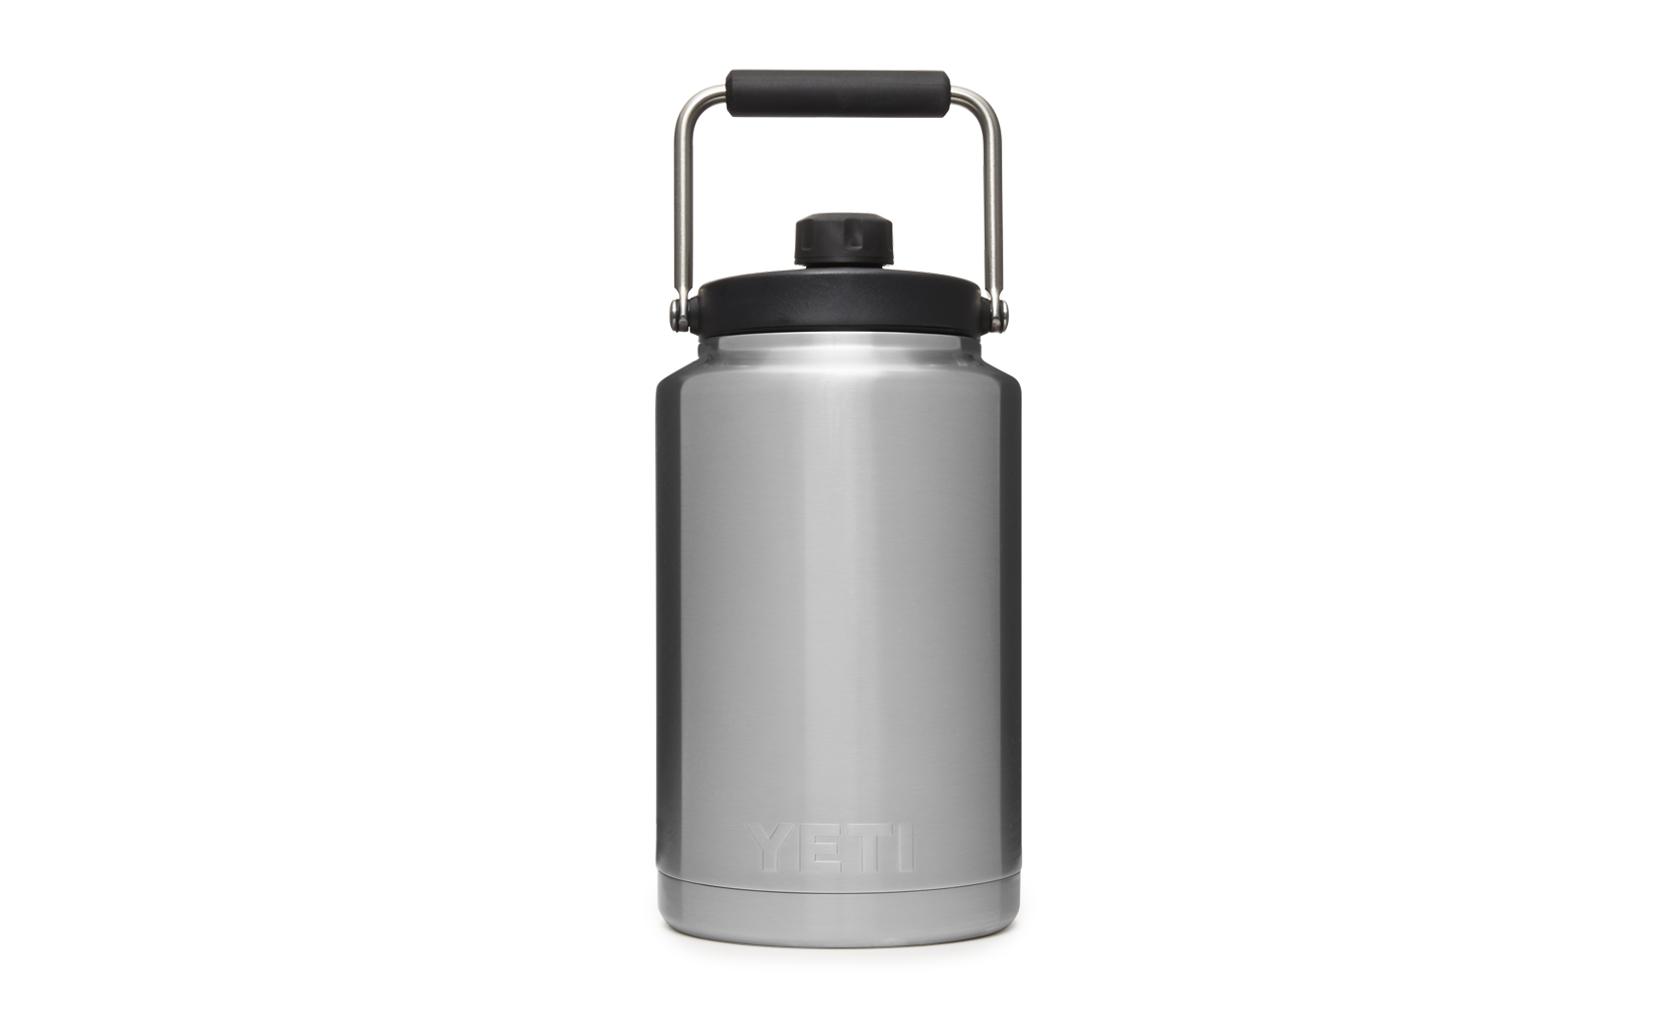 groom gift guide yeti rambler one gallon jug